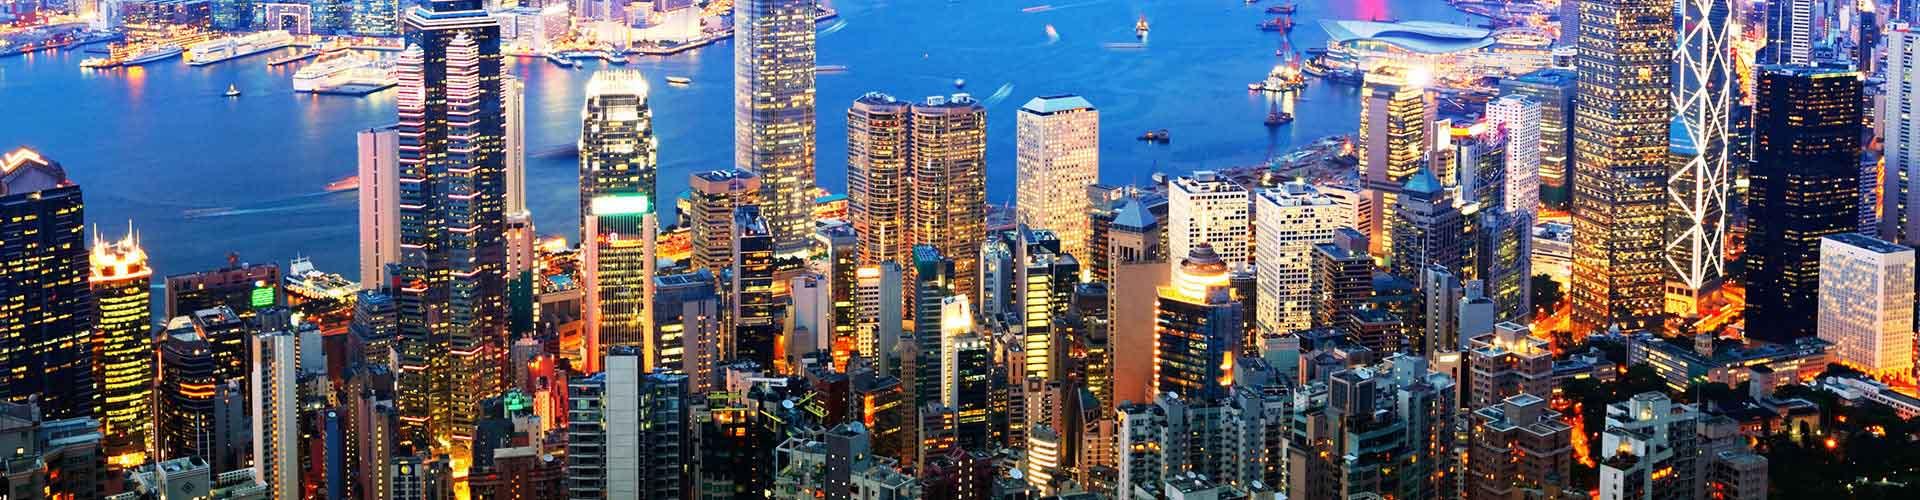 Hong Kong – Campeggi a Hong Kong. Mappe per Hong Kong, Foto e  Recensioni per ogni Campeggio a Hong Kong.